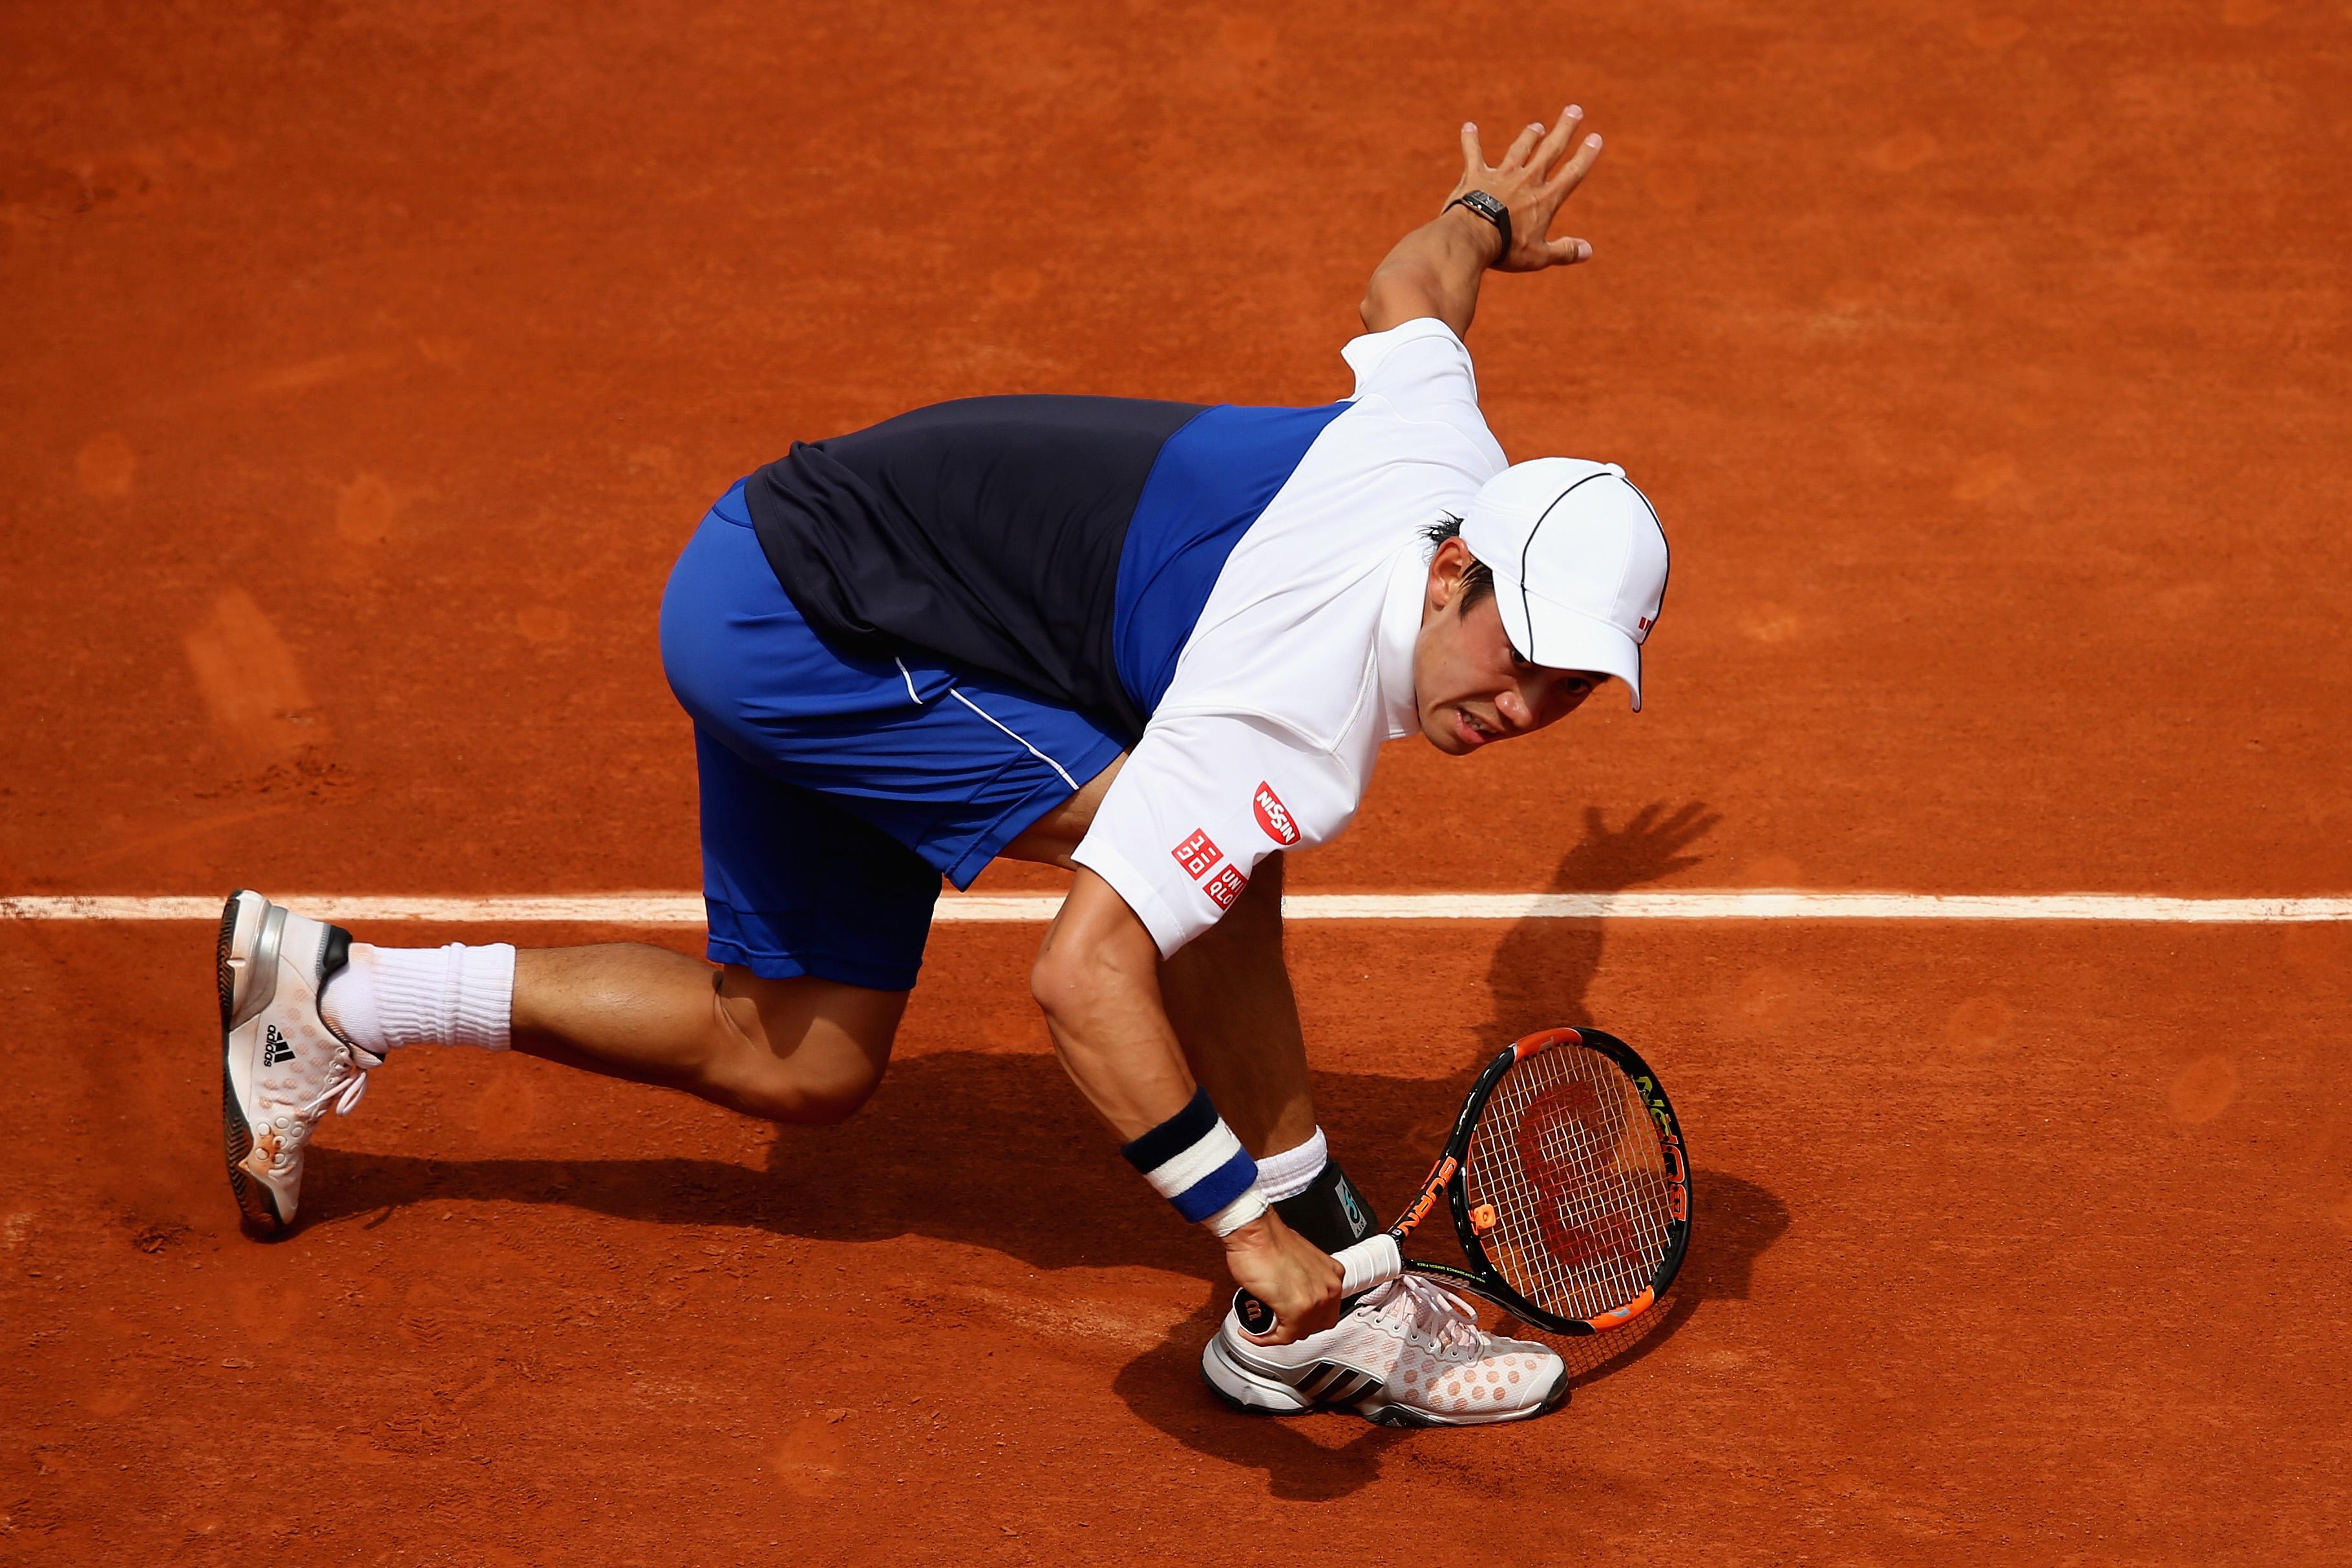 No. 5 seed Kei Nishikori topped French wildcard Paul Henri Matheiu 6–3, 7–5, 6–1.